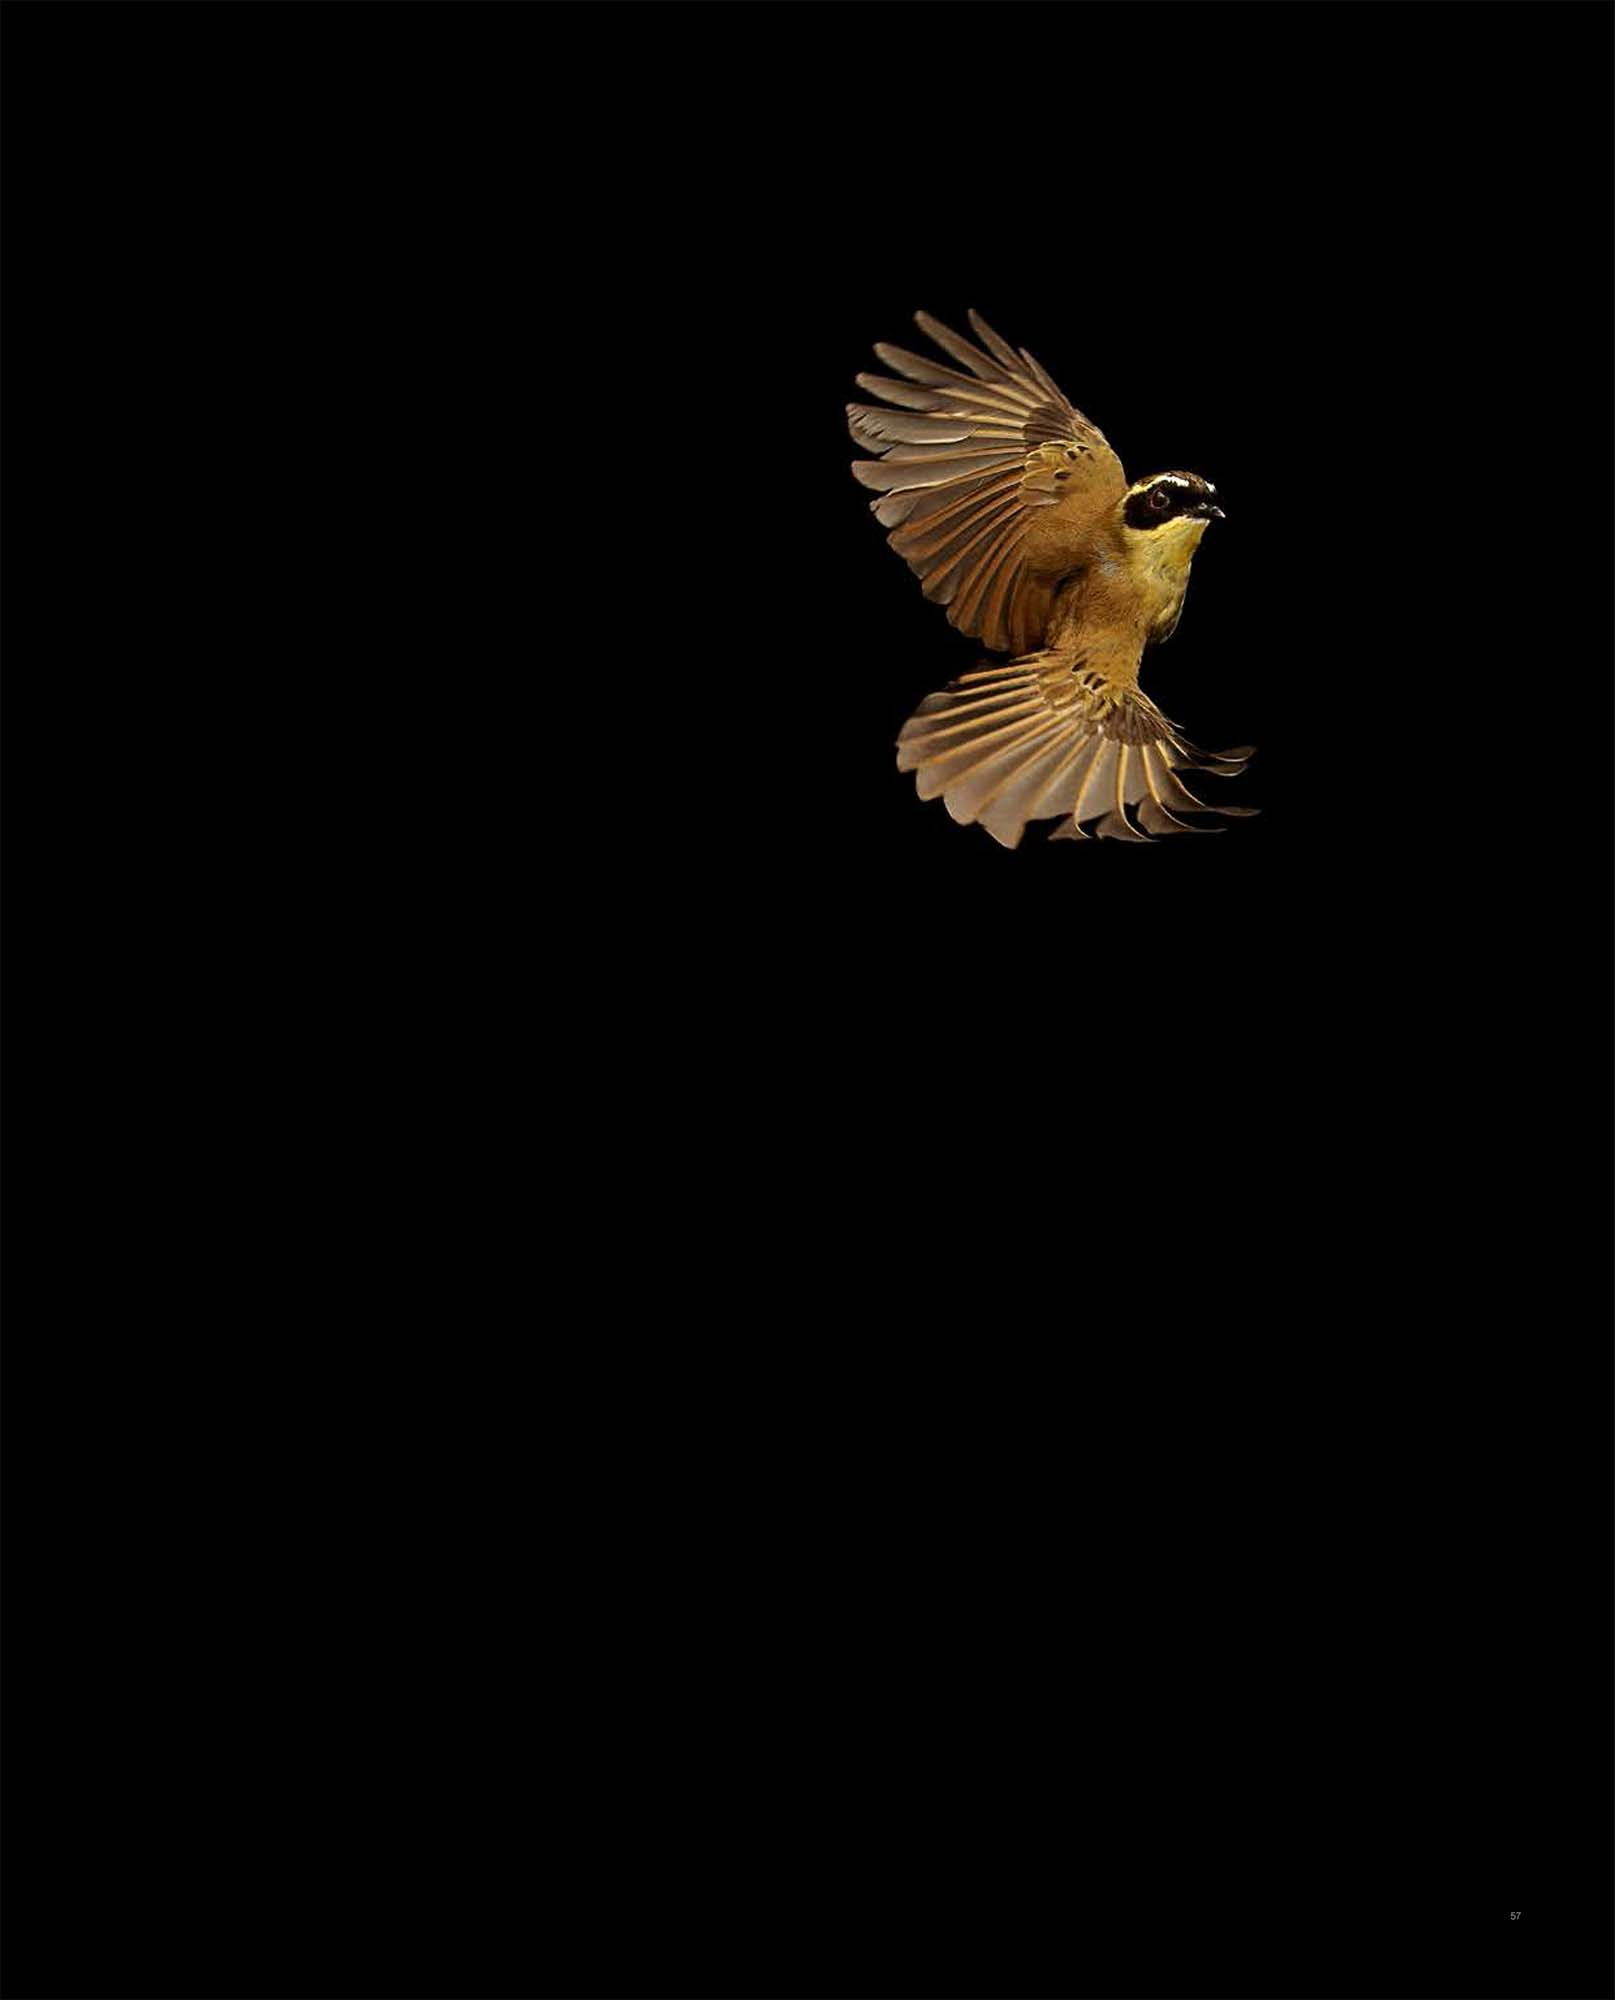 BIRD Gary Heery Book-completemmockup-59.jpg